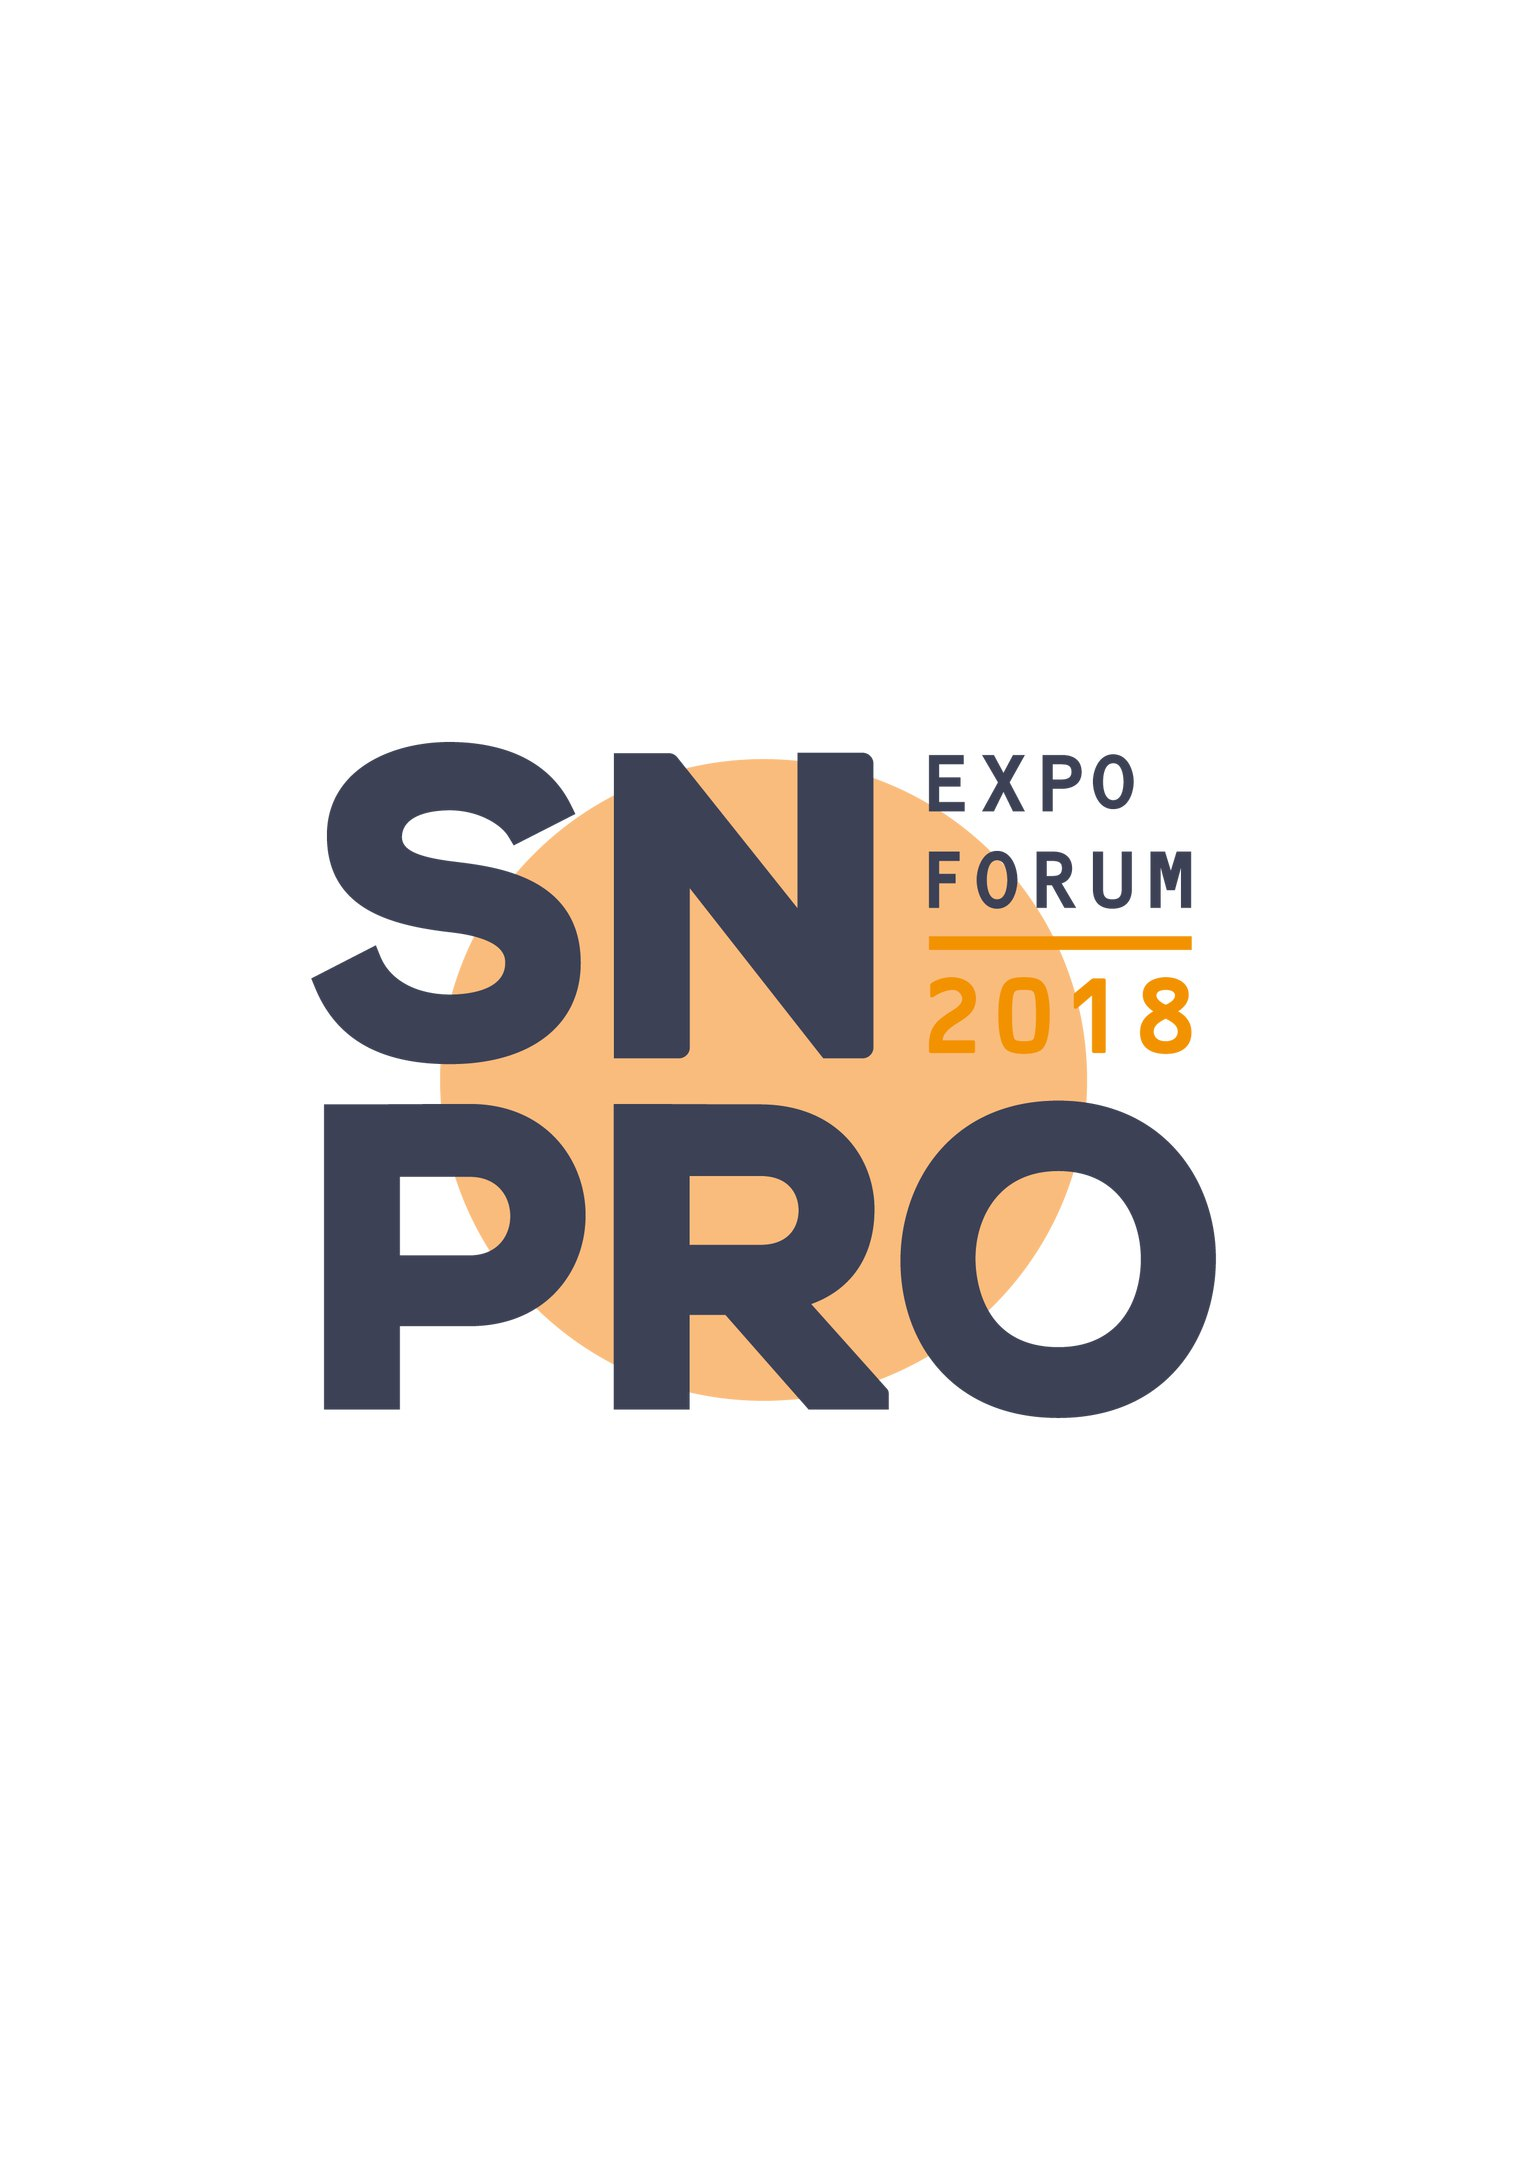 SN PRO EXPO FORUM 2018